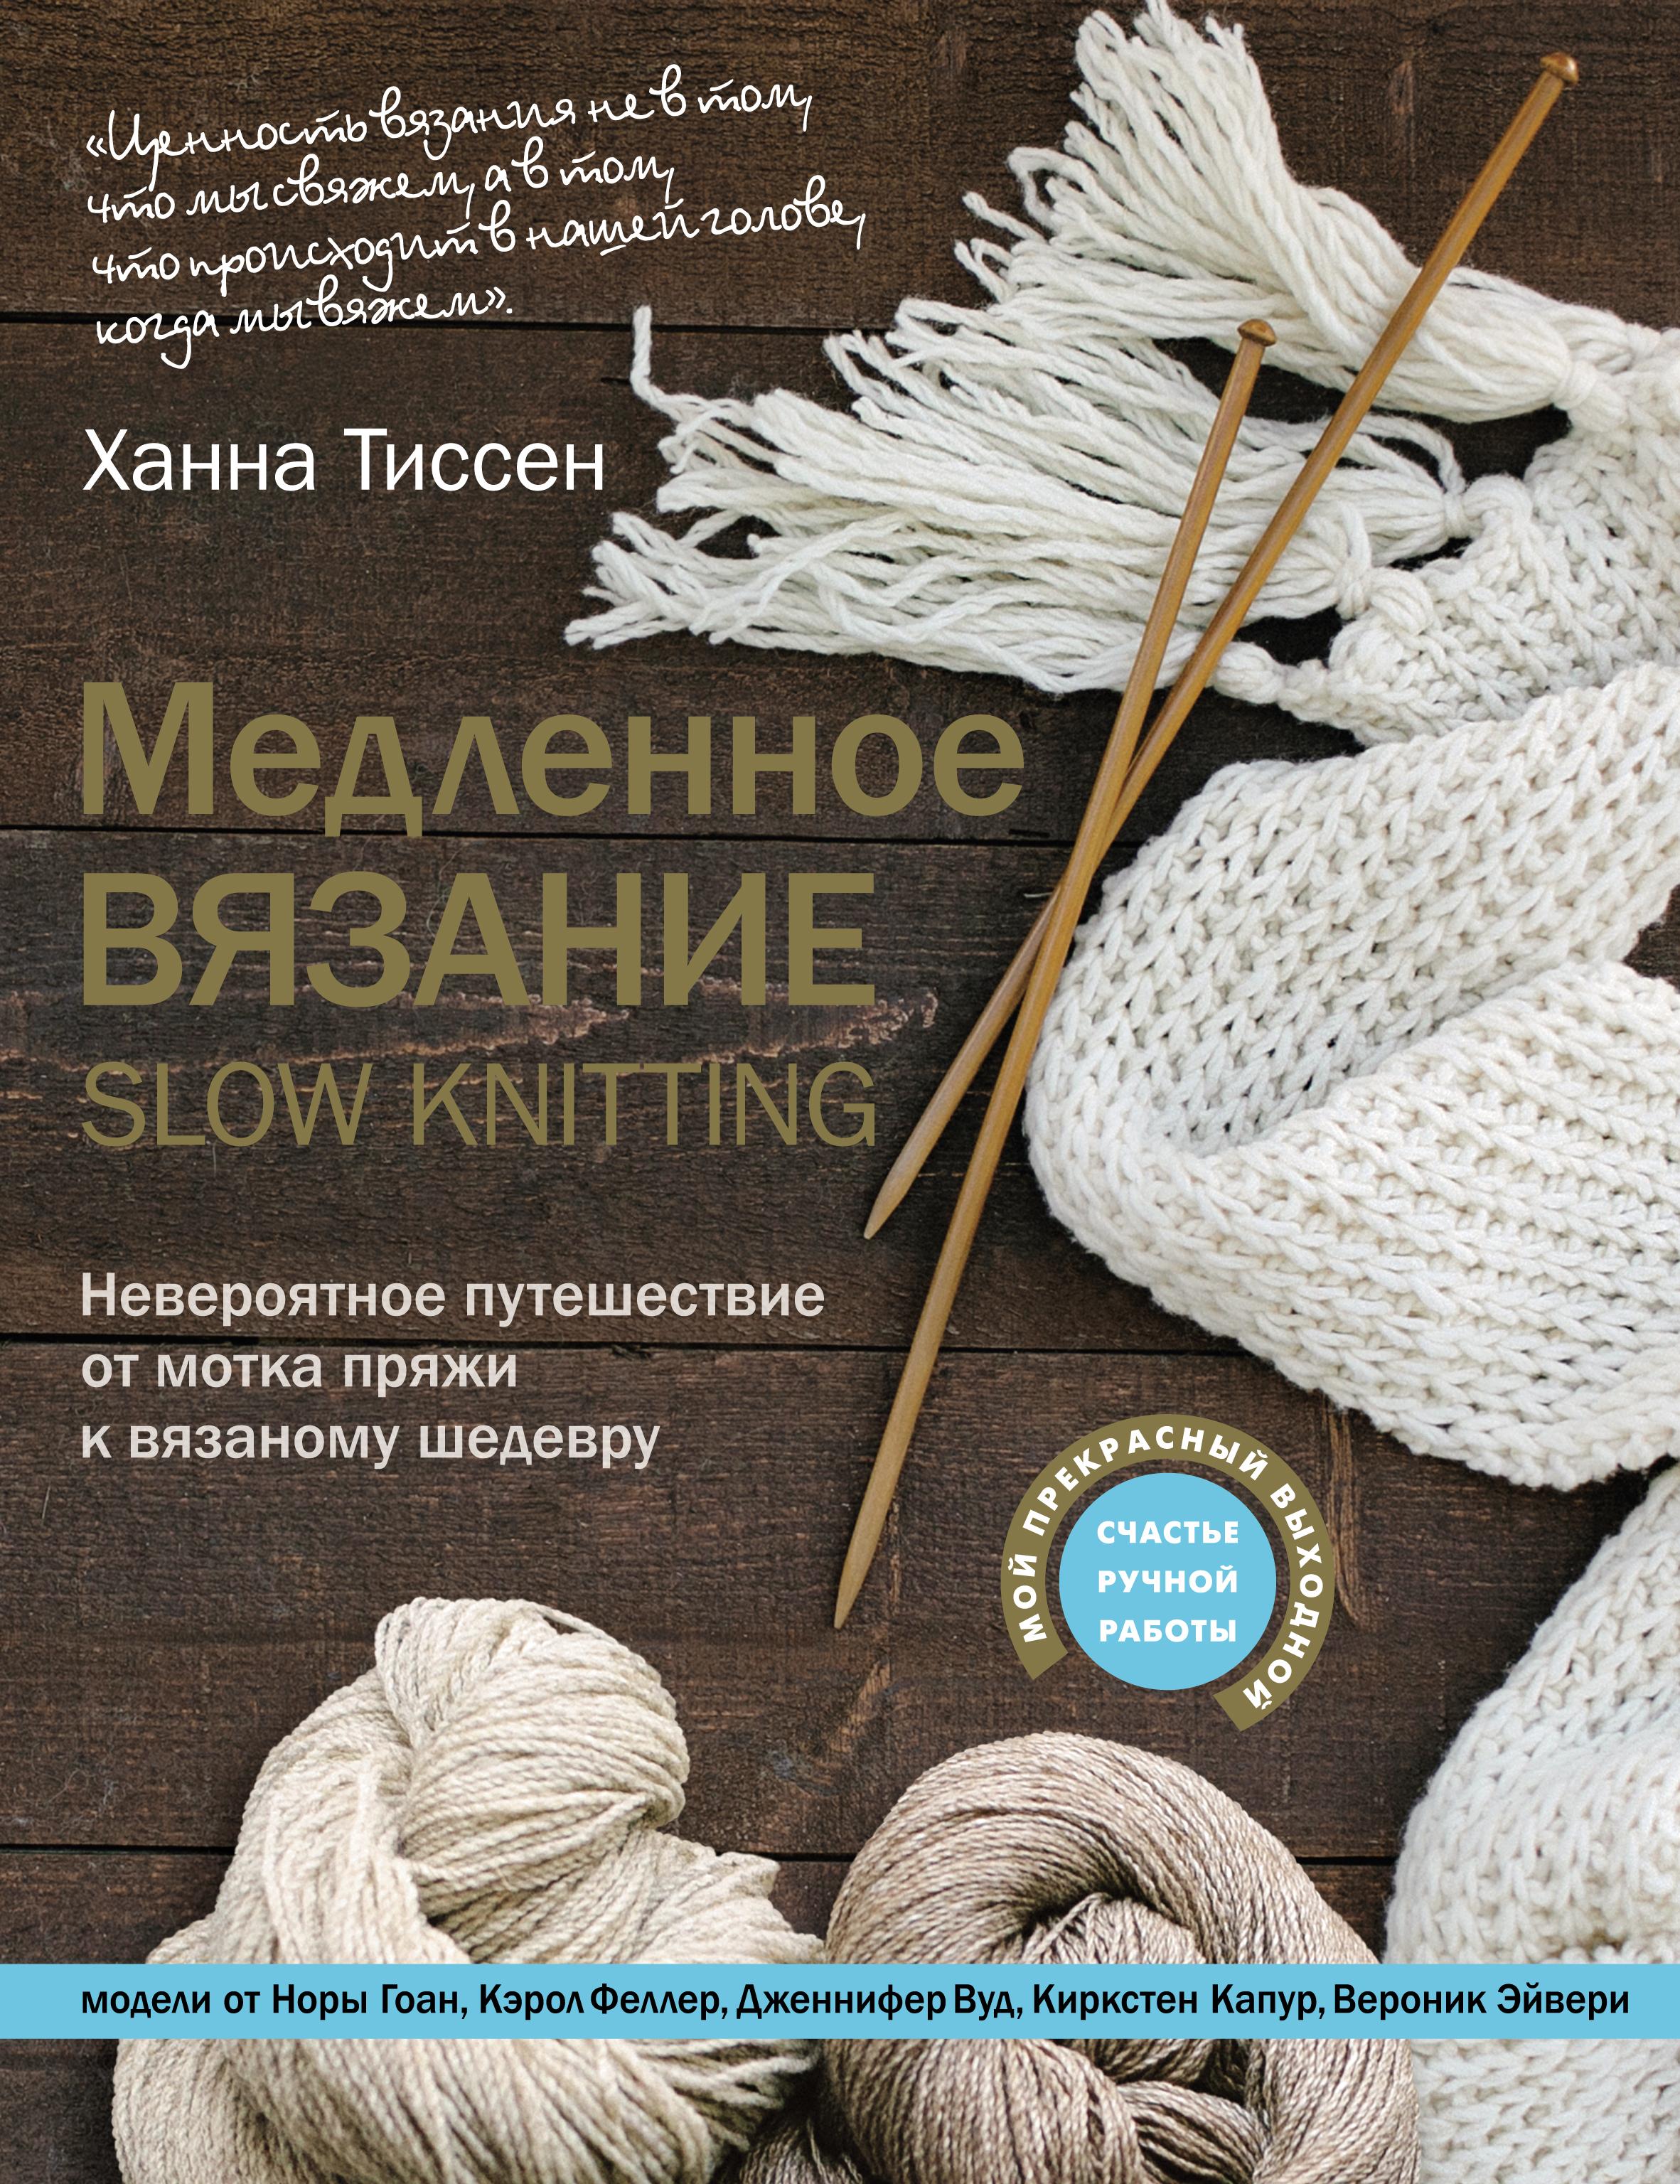 Ханна Тиссен Медленное вязание – SLOW KNITTING. Невероятное путешествие от мотка пряжи к вязаному шедевру тиссен ханна медленное вязание slow knitting невероятное путешествие от мотка пряжи к вязаному шедевру